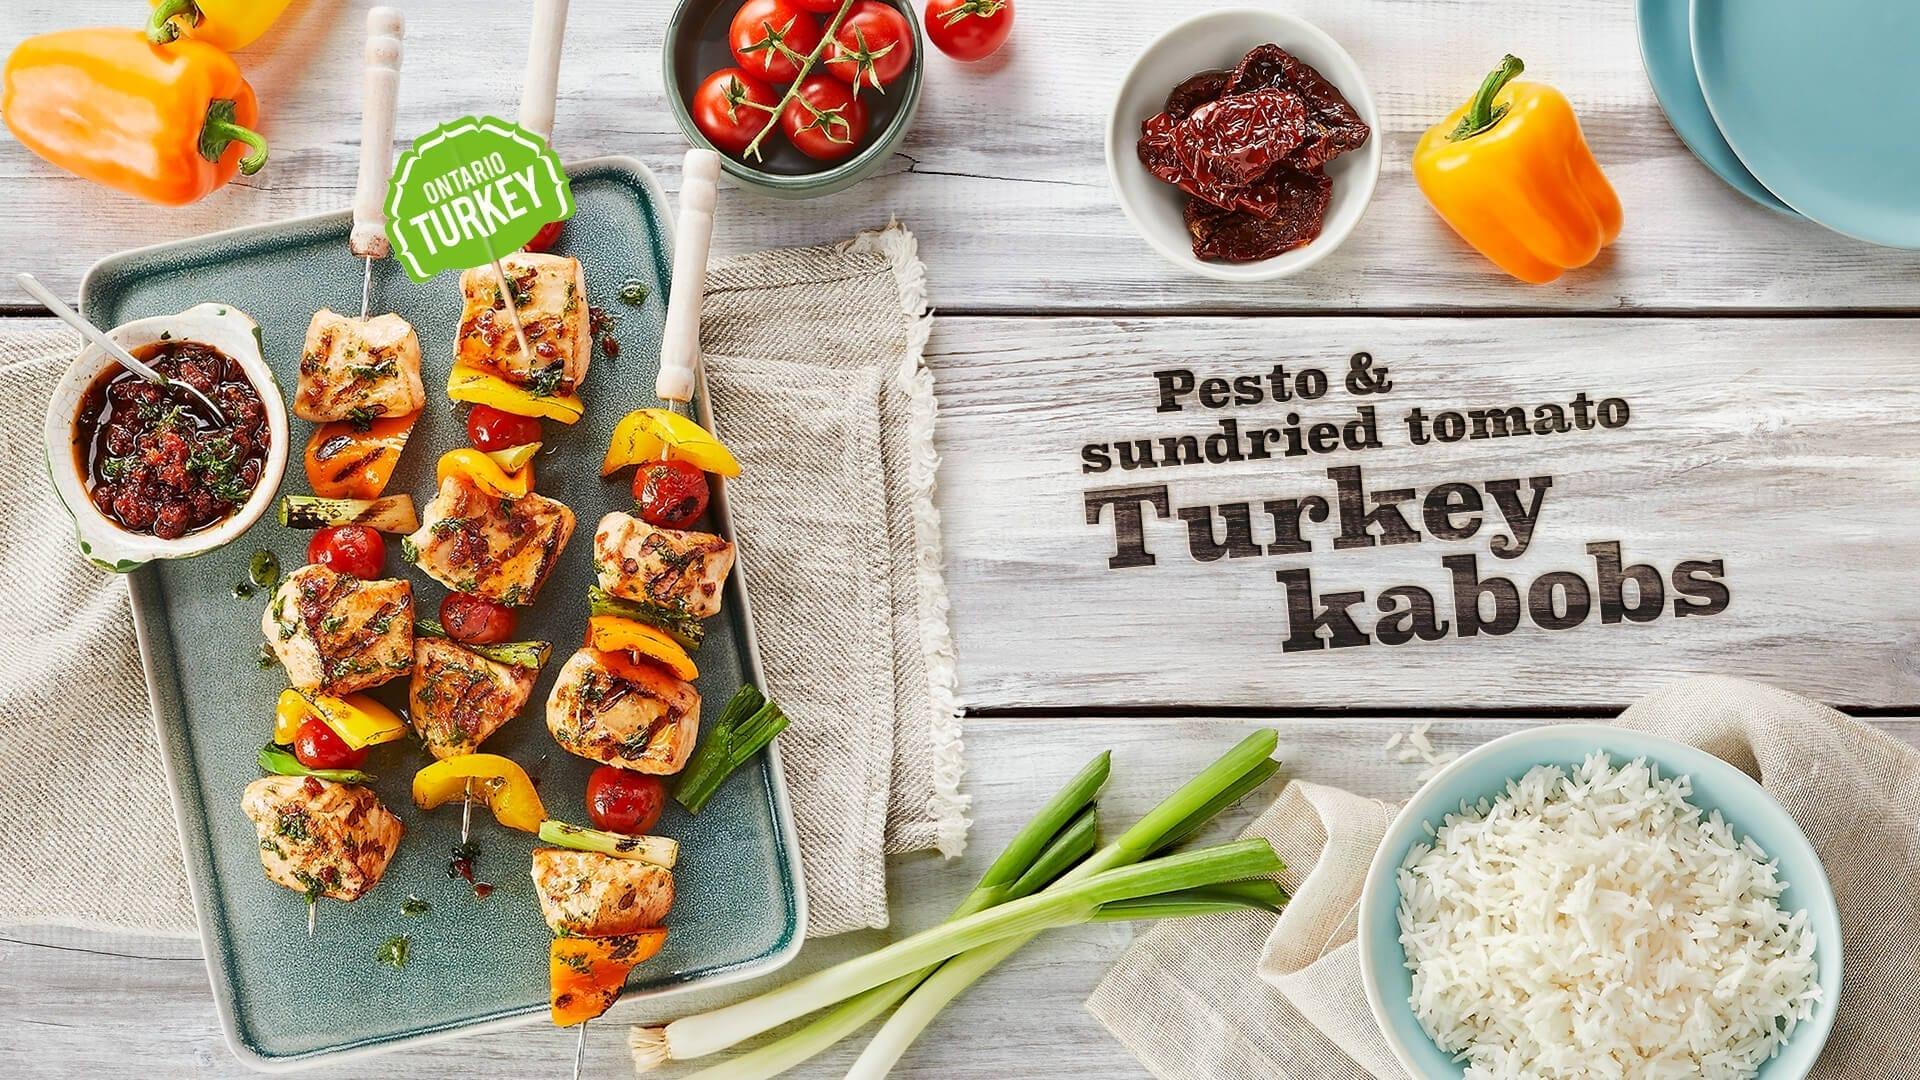 Ontario Turkey recipe photography